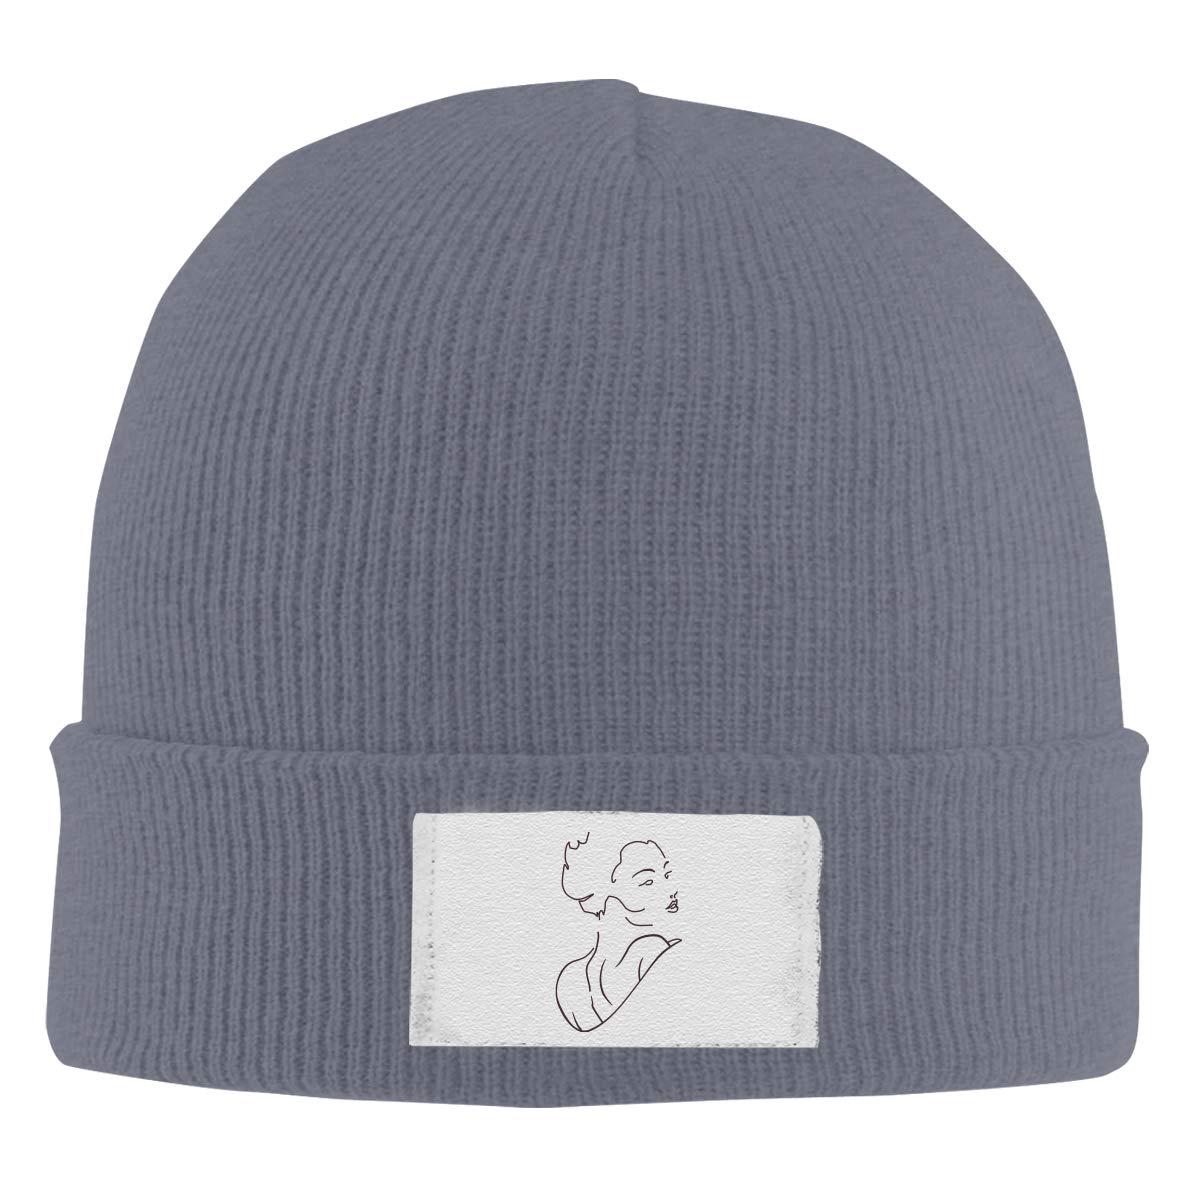 Dunpaiaa Skull Caps Geisha Winter Warm Knit Hats Stretchy Cuff Beanie Hat Black